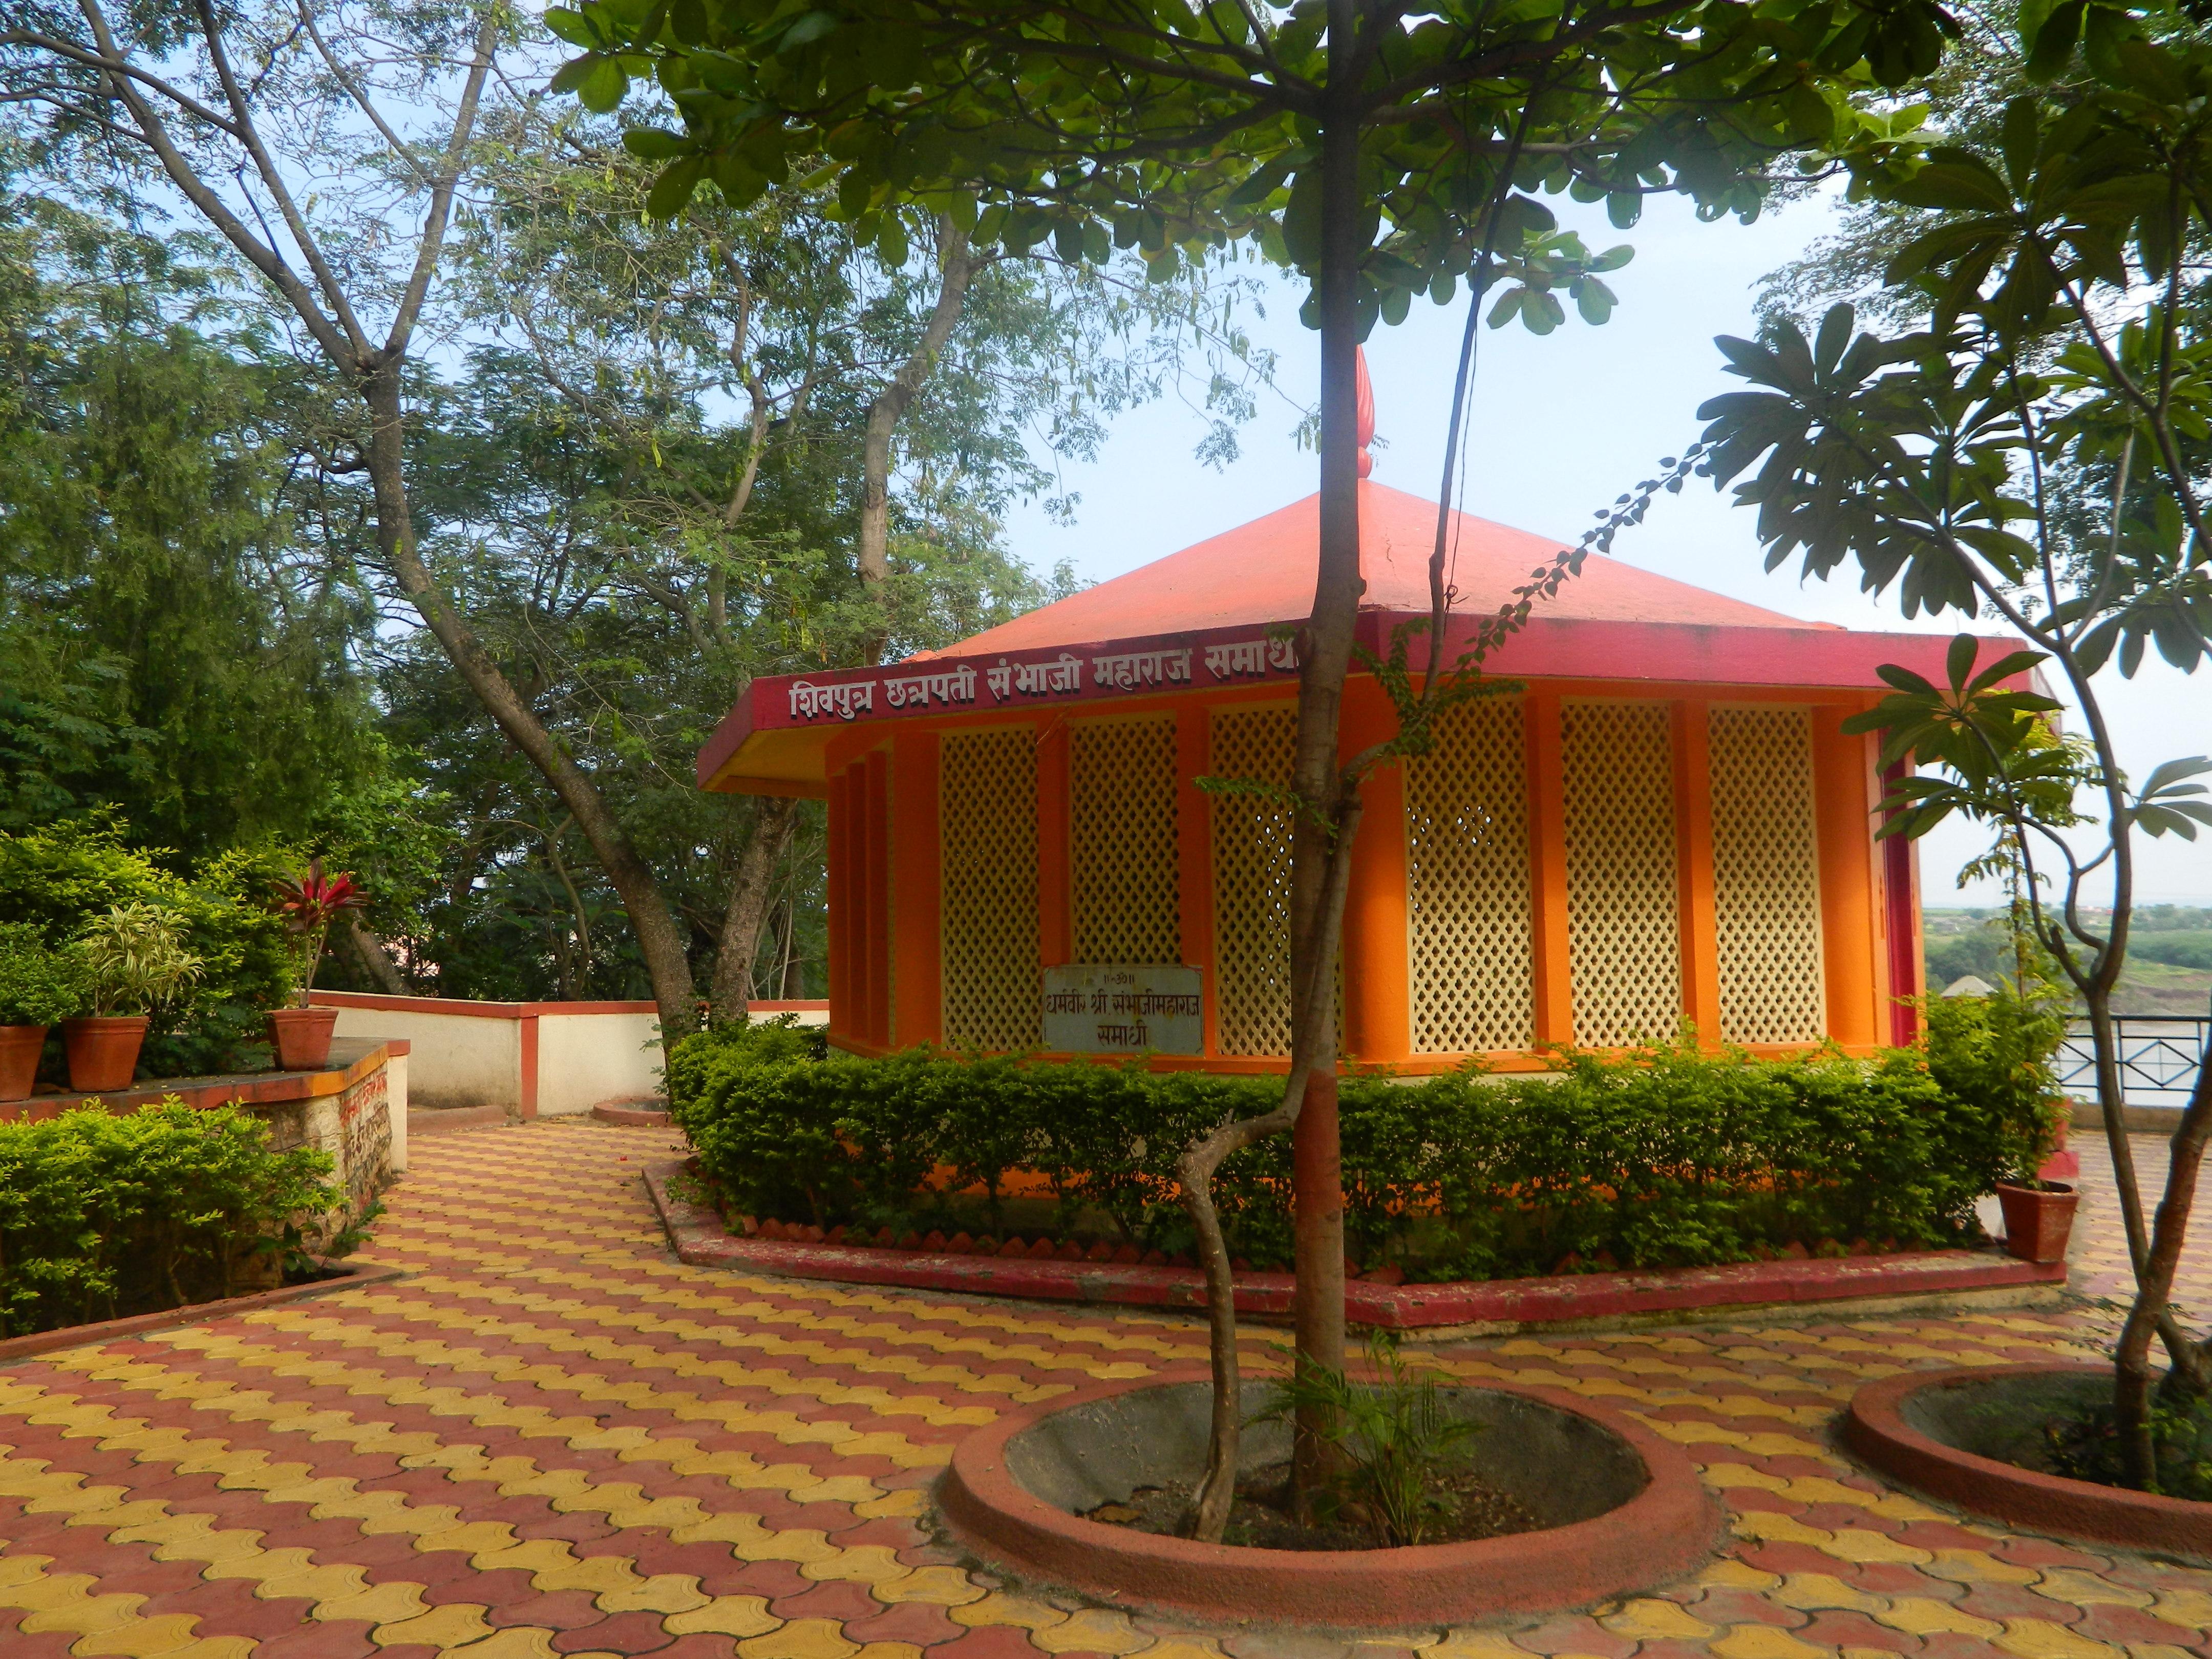 file shivputra chattrapati sambhaji maharaj samadhi jpg